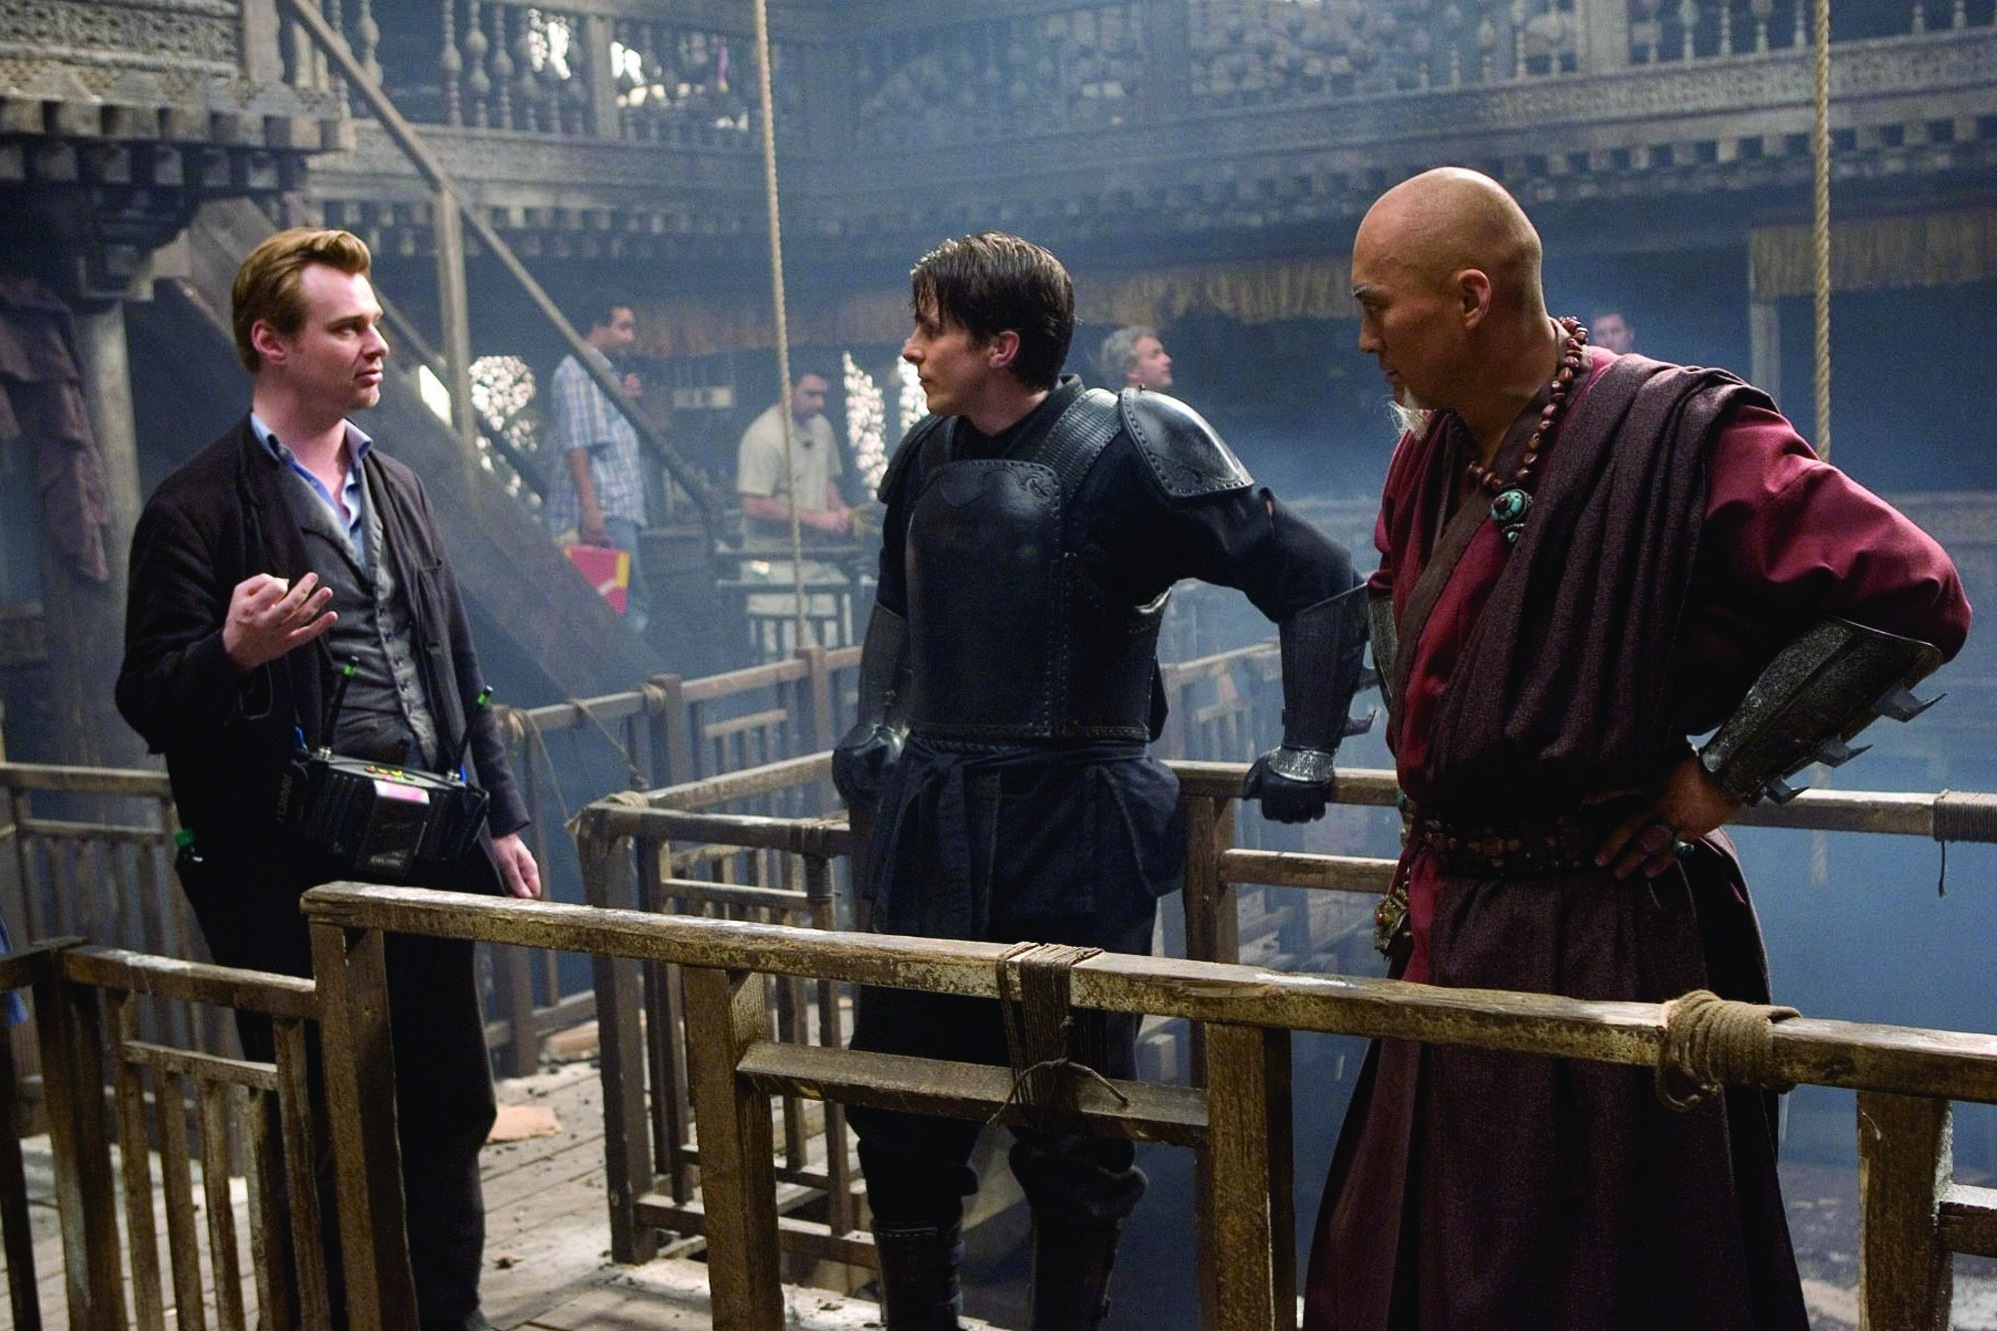 Christian Bale, Christopher Nolan, and Ken Watanabe in Batman Begins (2005)